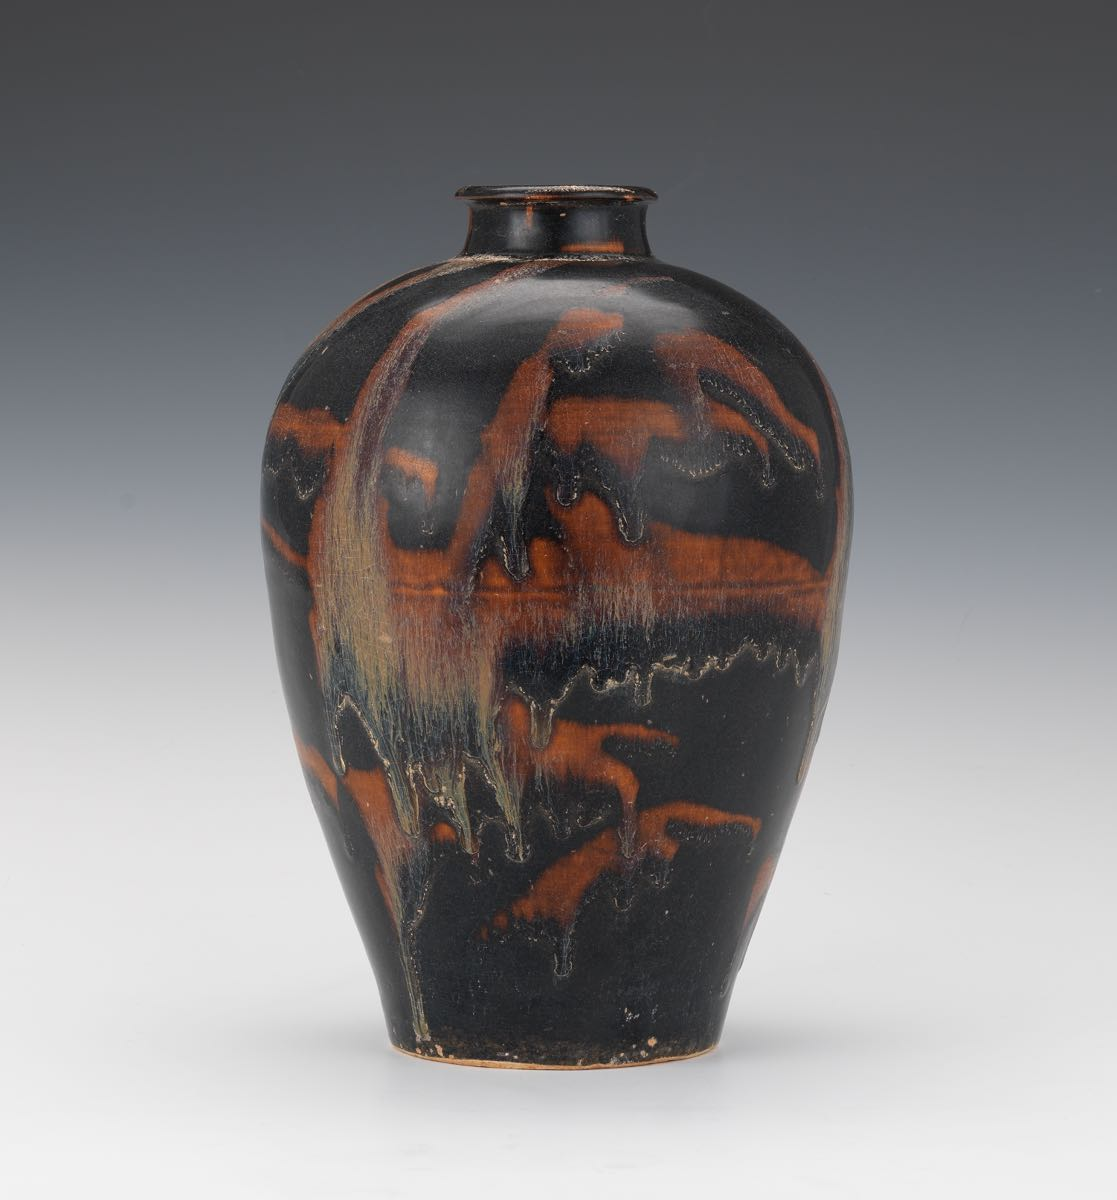 Studio pottery vase 20th century 022115 sold 69 studio pottery vase 20th century reviewsmspy